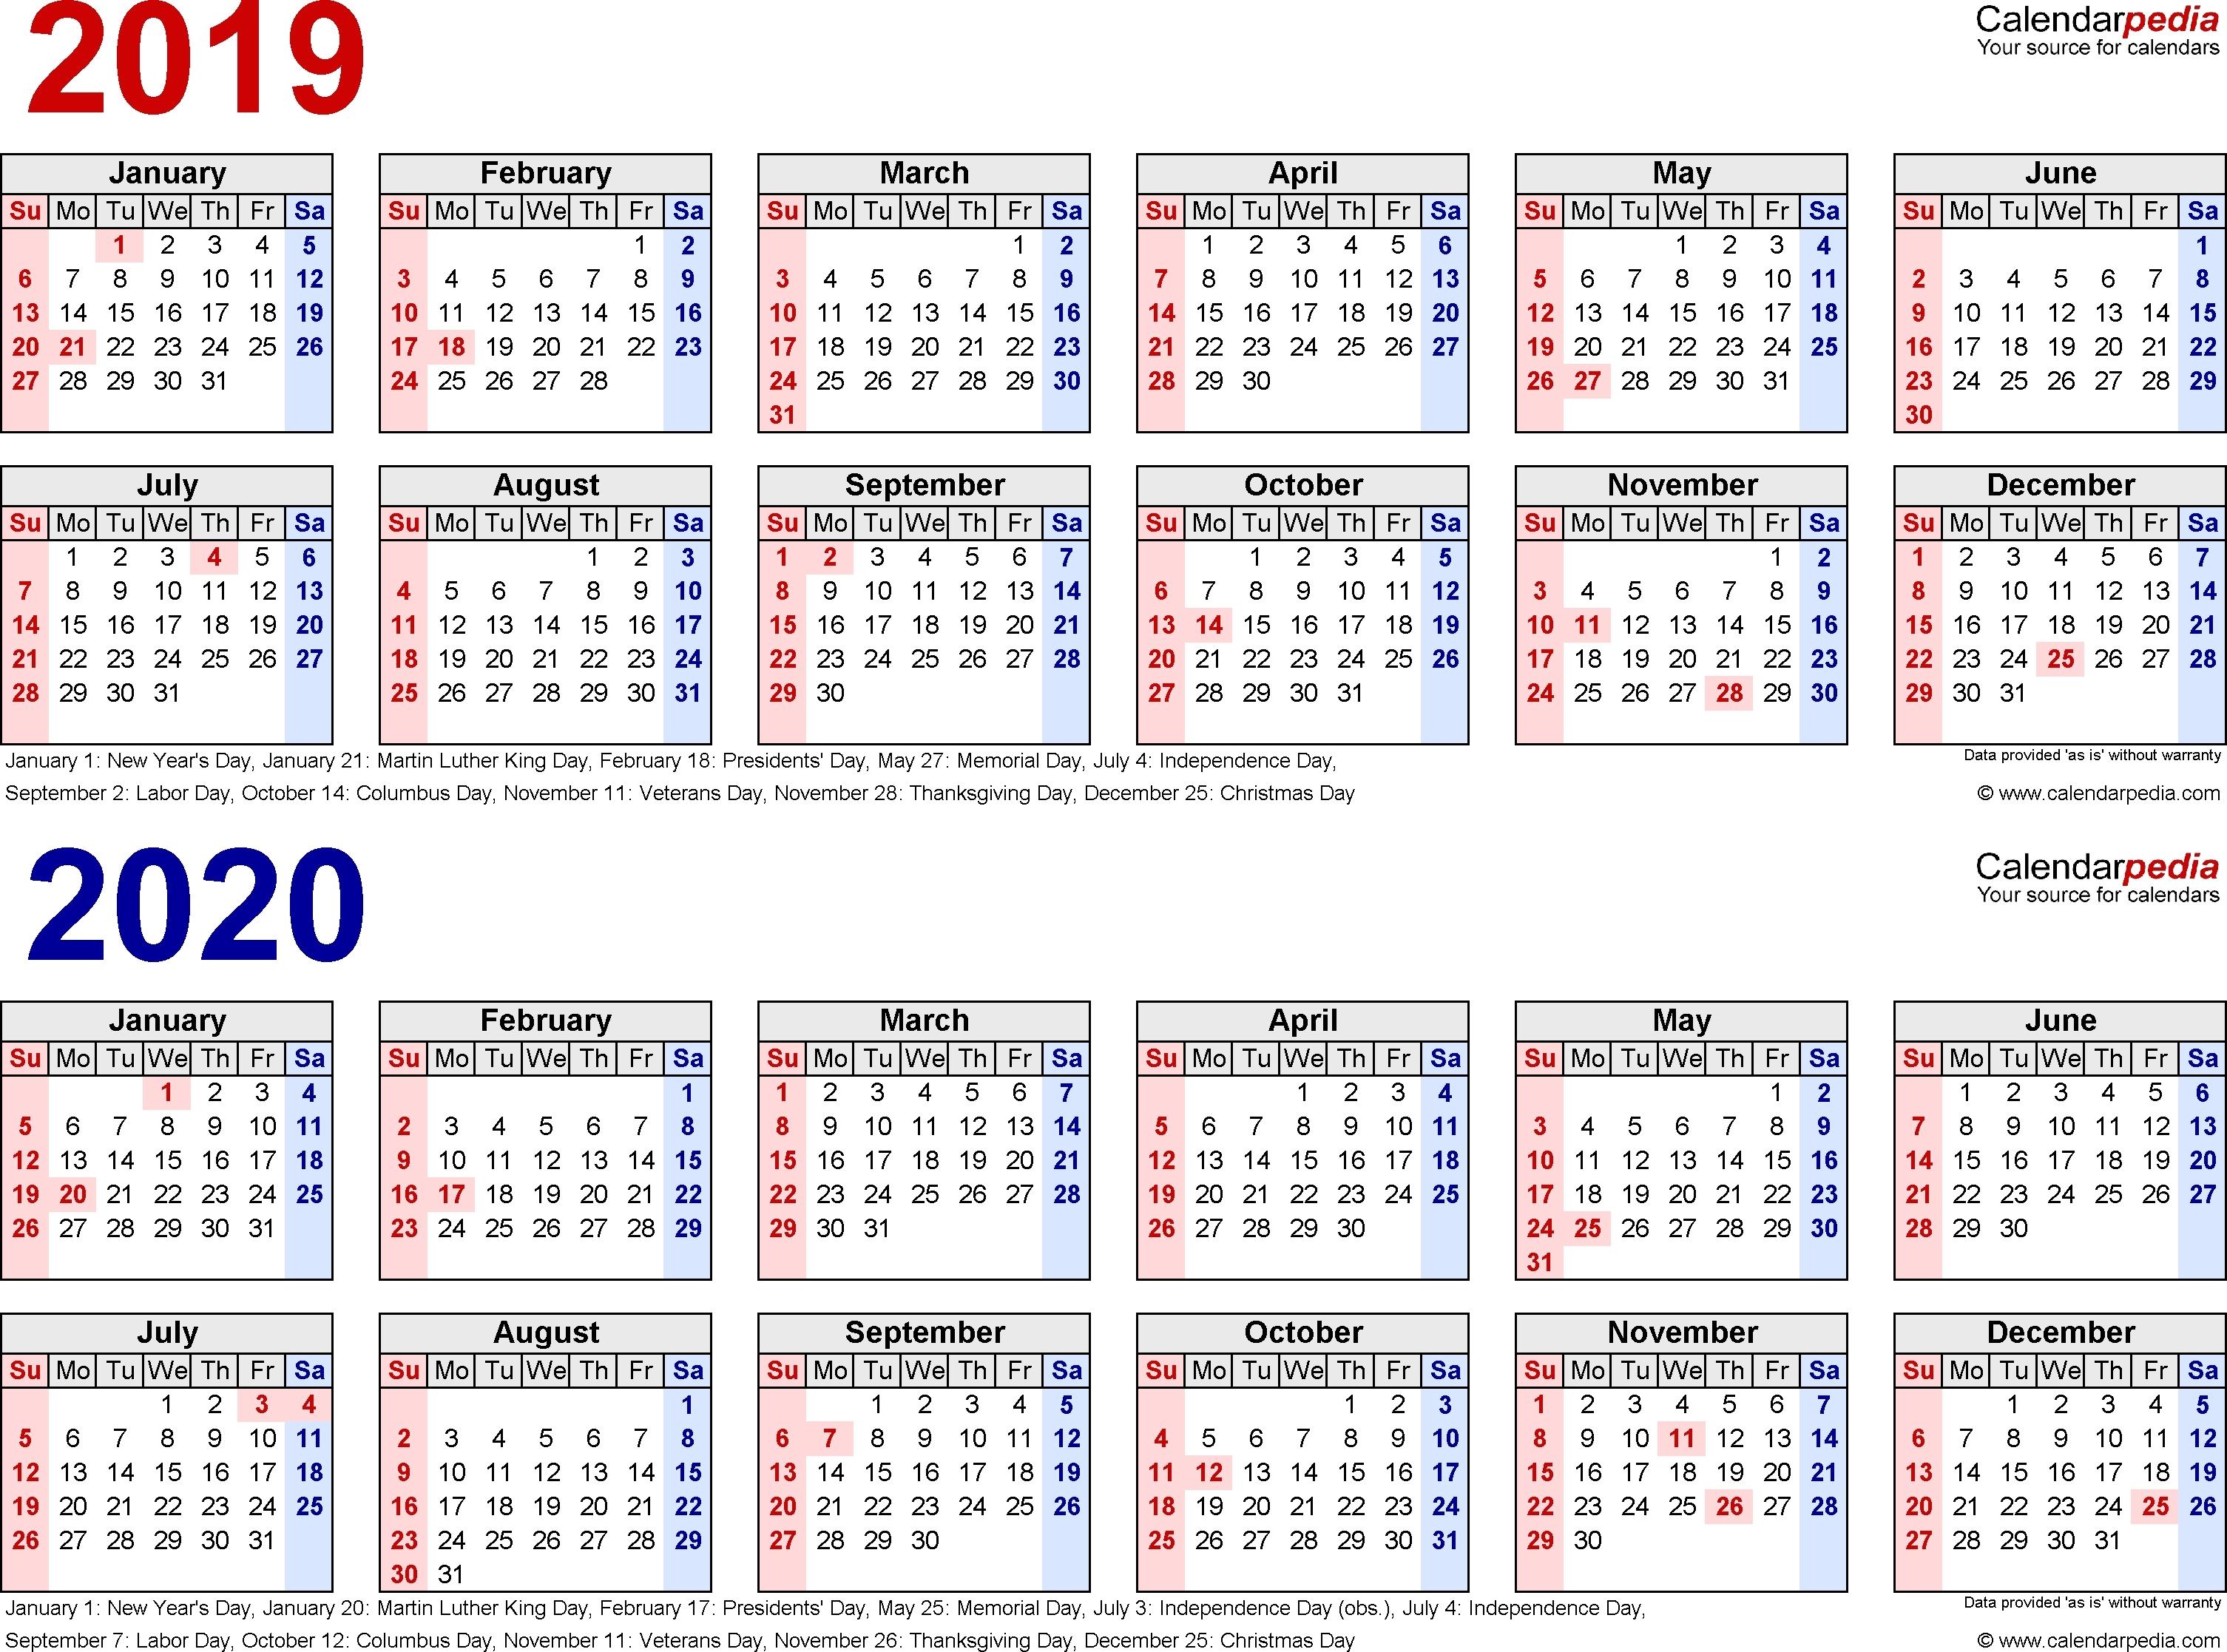 Islamic Calendar 2020-2020 Calendar Muslim Holidays